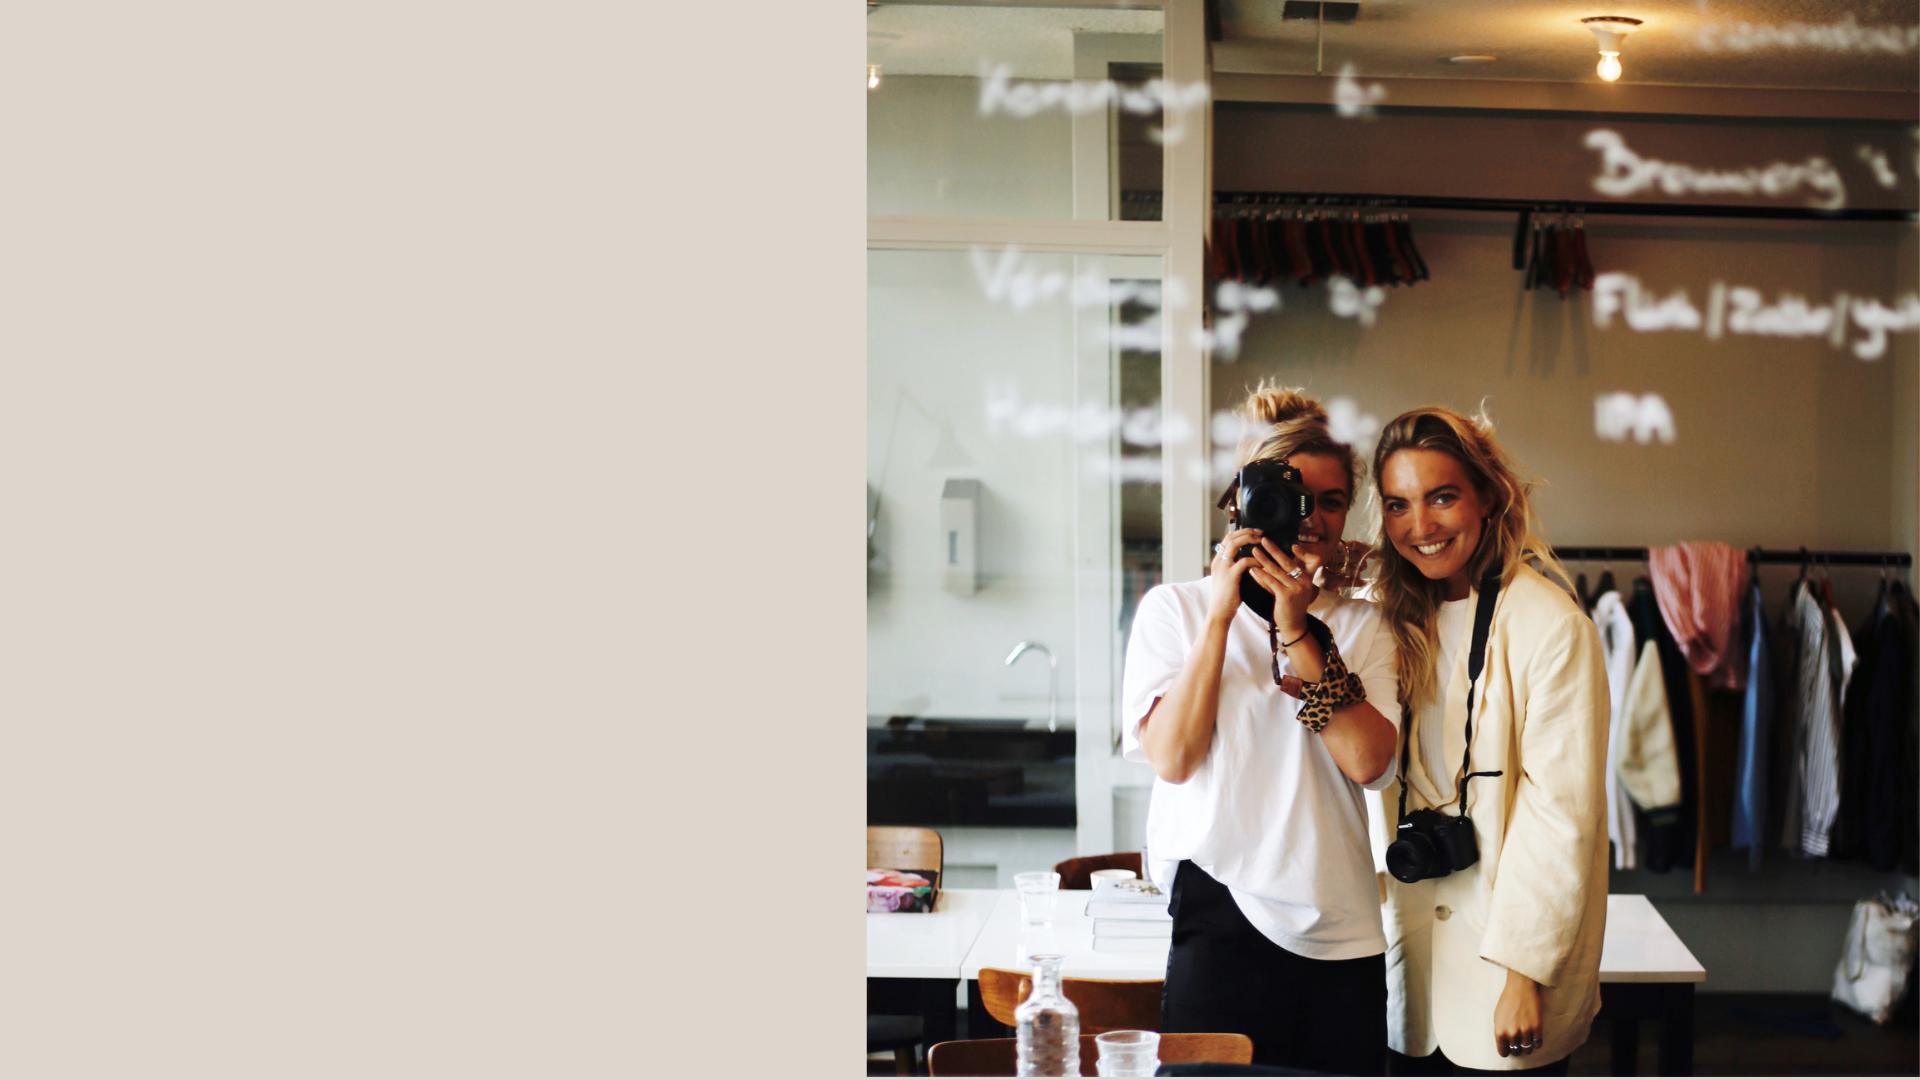 horeca-fotoshoot-boeken-restaurant-cafe-social-media